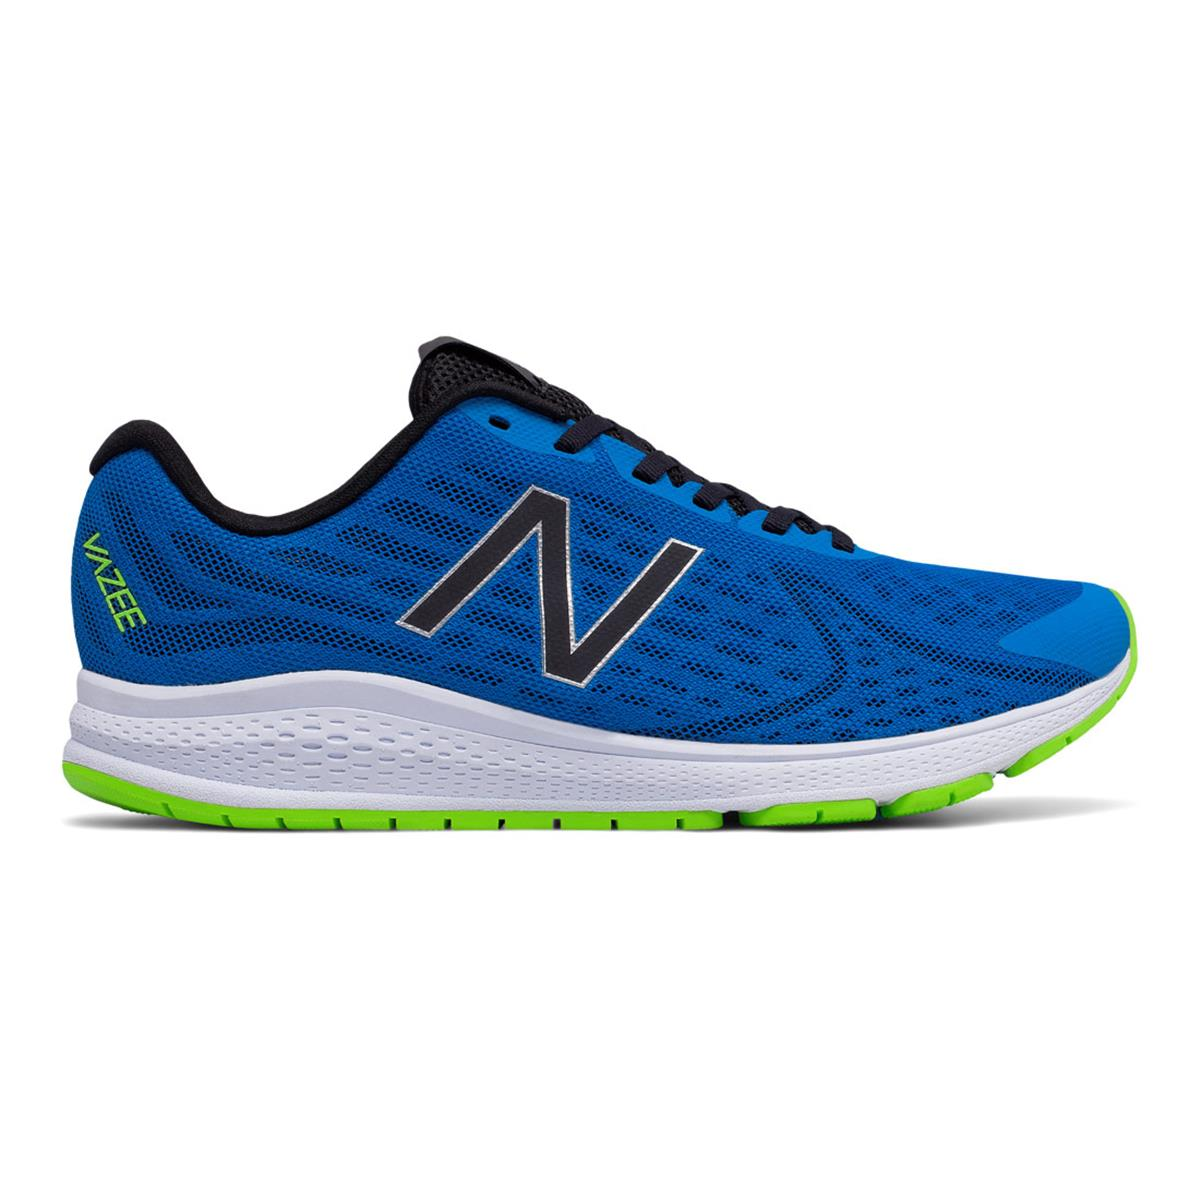 New Balance Vazee Rush V Blue Mens Shoes Review